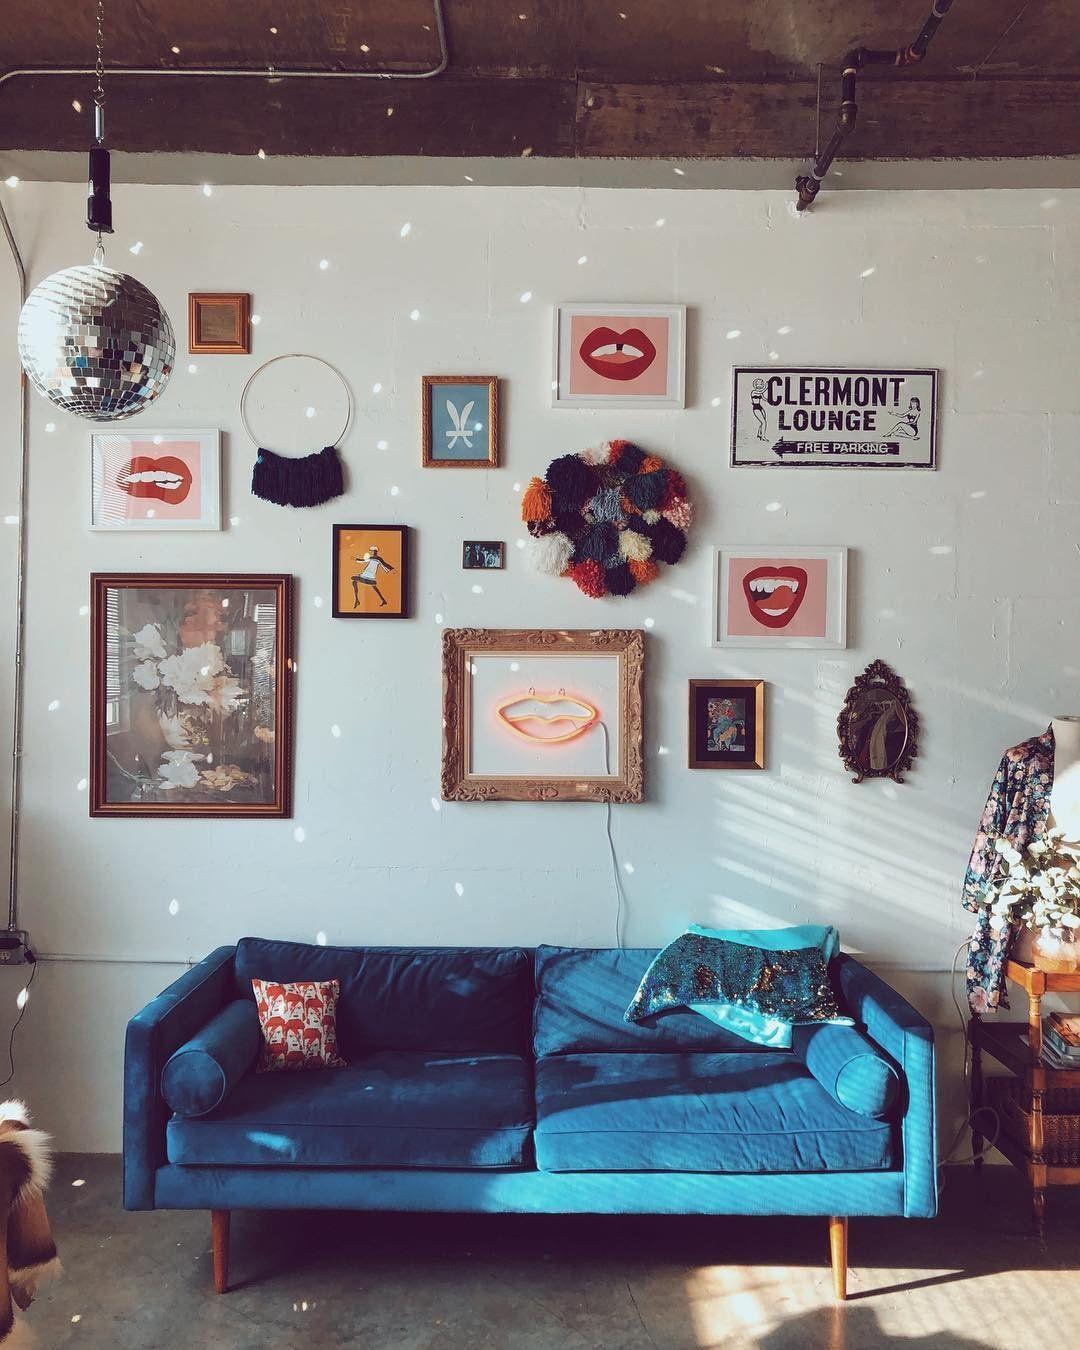 Pin de pomelo grapefruit en Furniture DIY Recycle Upcycle